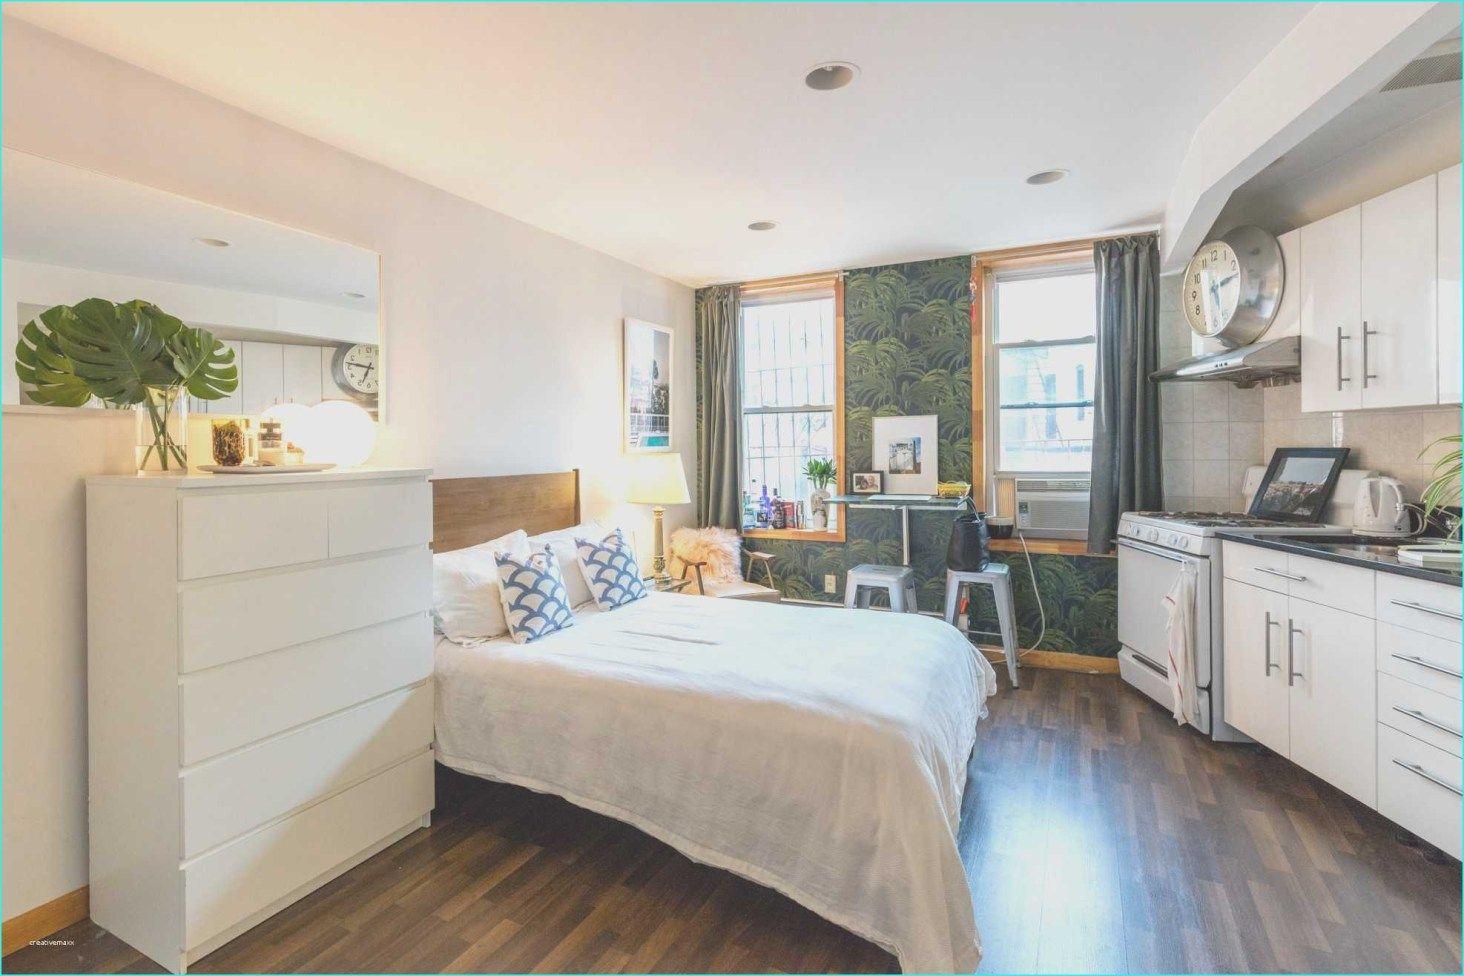 44 Cozy Extra Small Studio Apartment Ideas Truehome Apartment Bedroom Decor Apartment Room Apartment Interior